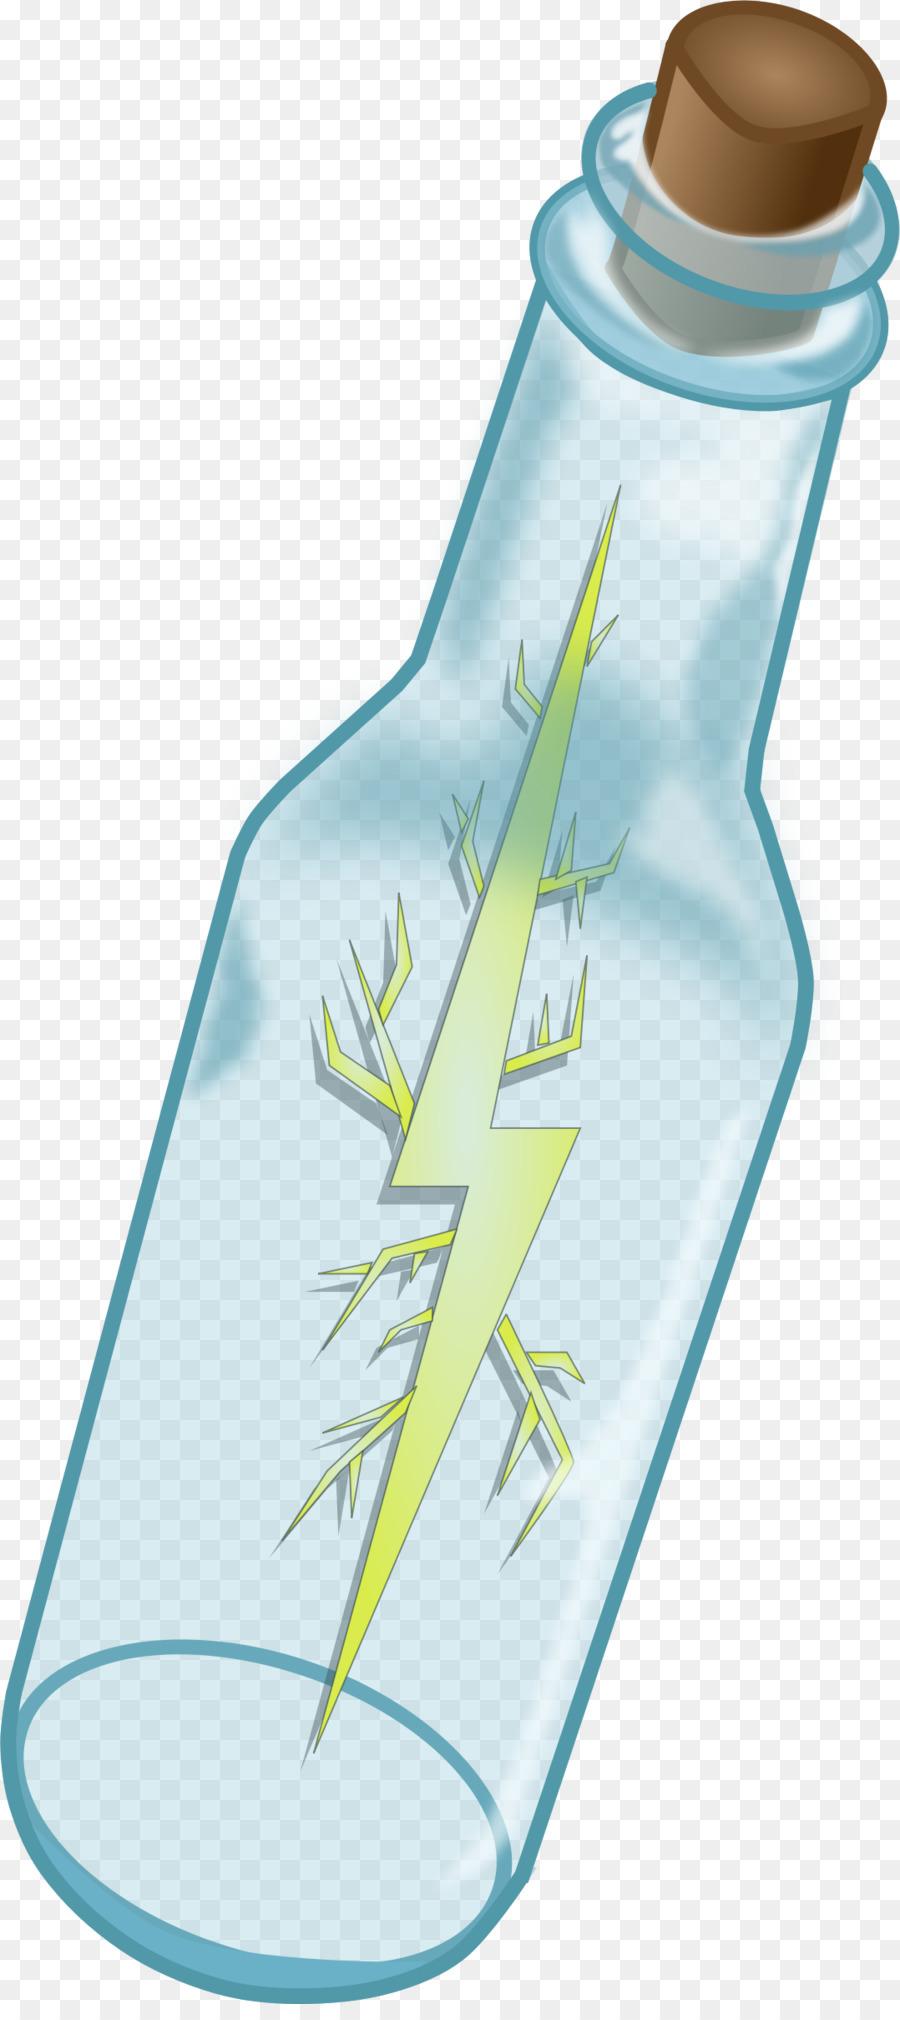 Botee clipart clipart transparent Water Bottle Drawing clipart - Drawing, Water, Product, transparent ... clipart transparent